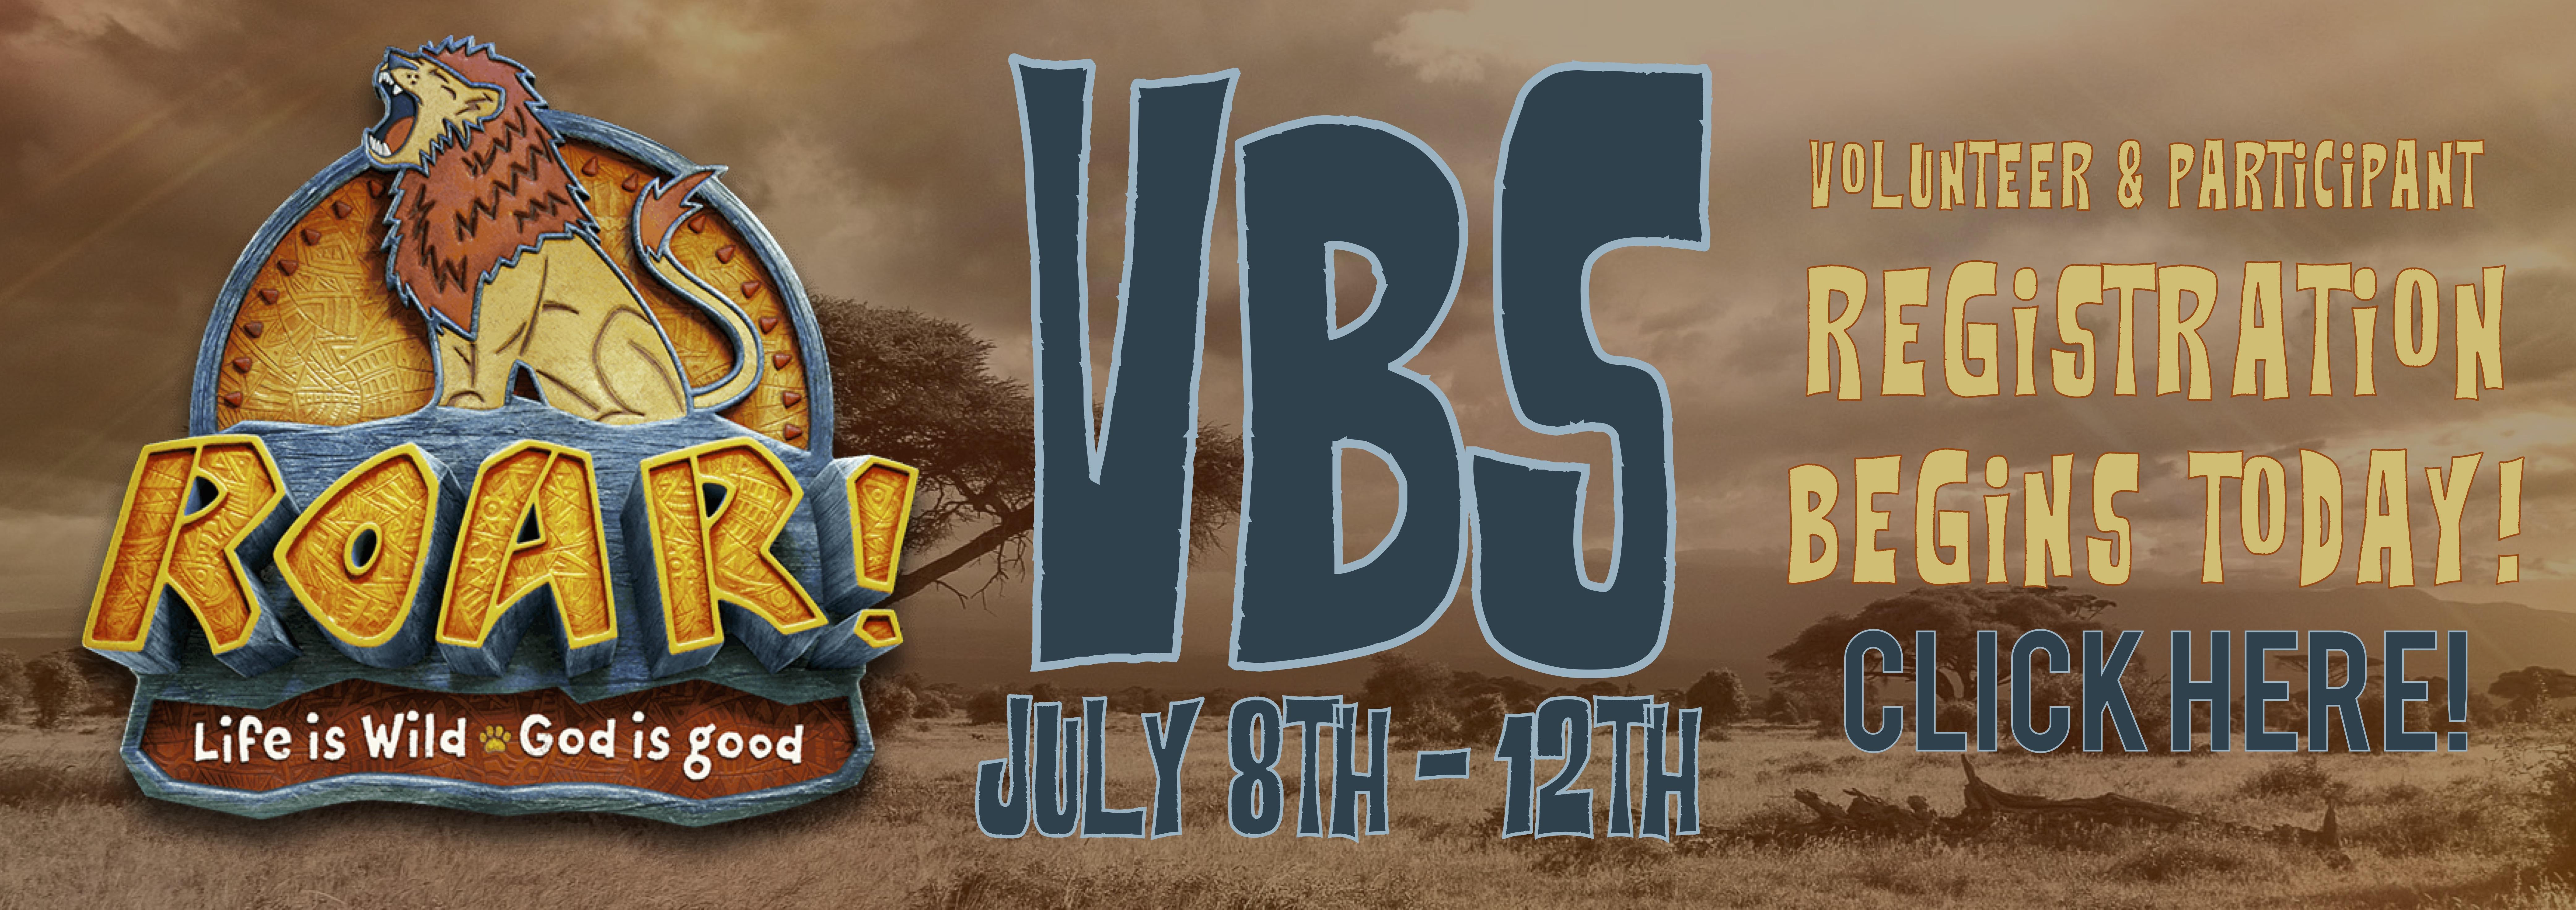 VBS_Banner_2019.jpg